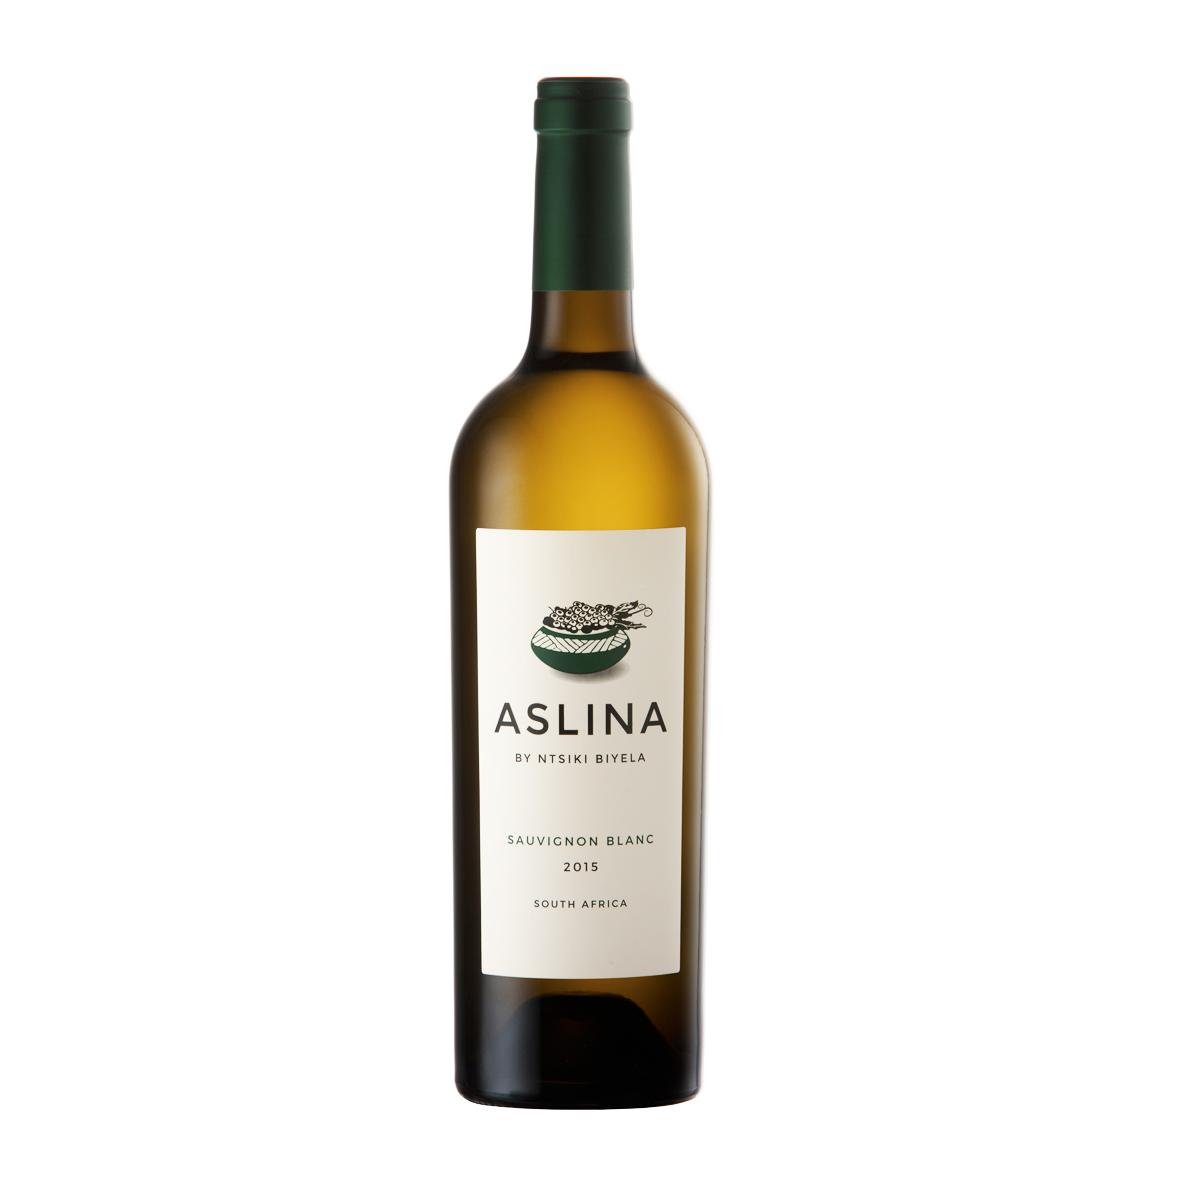 Aslina Sauvignon Blanc 2015